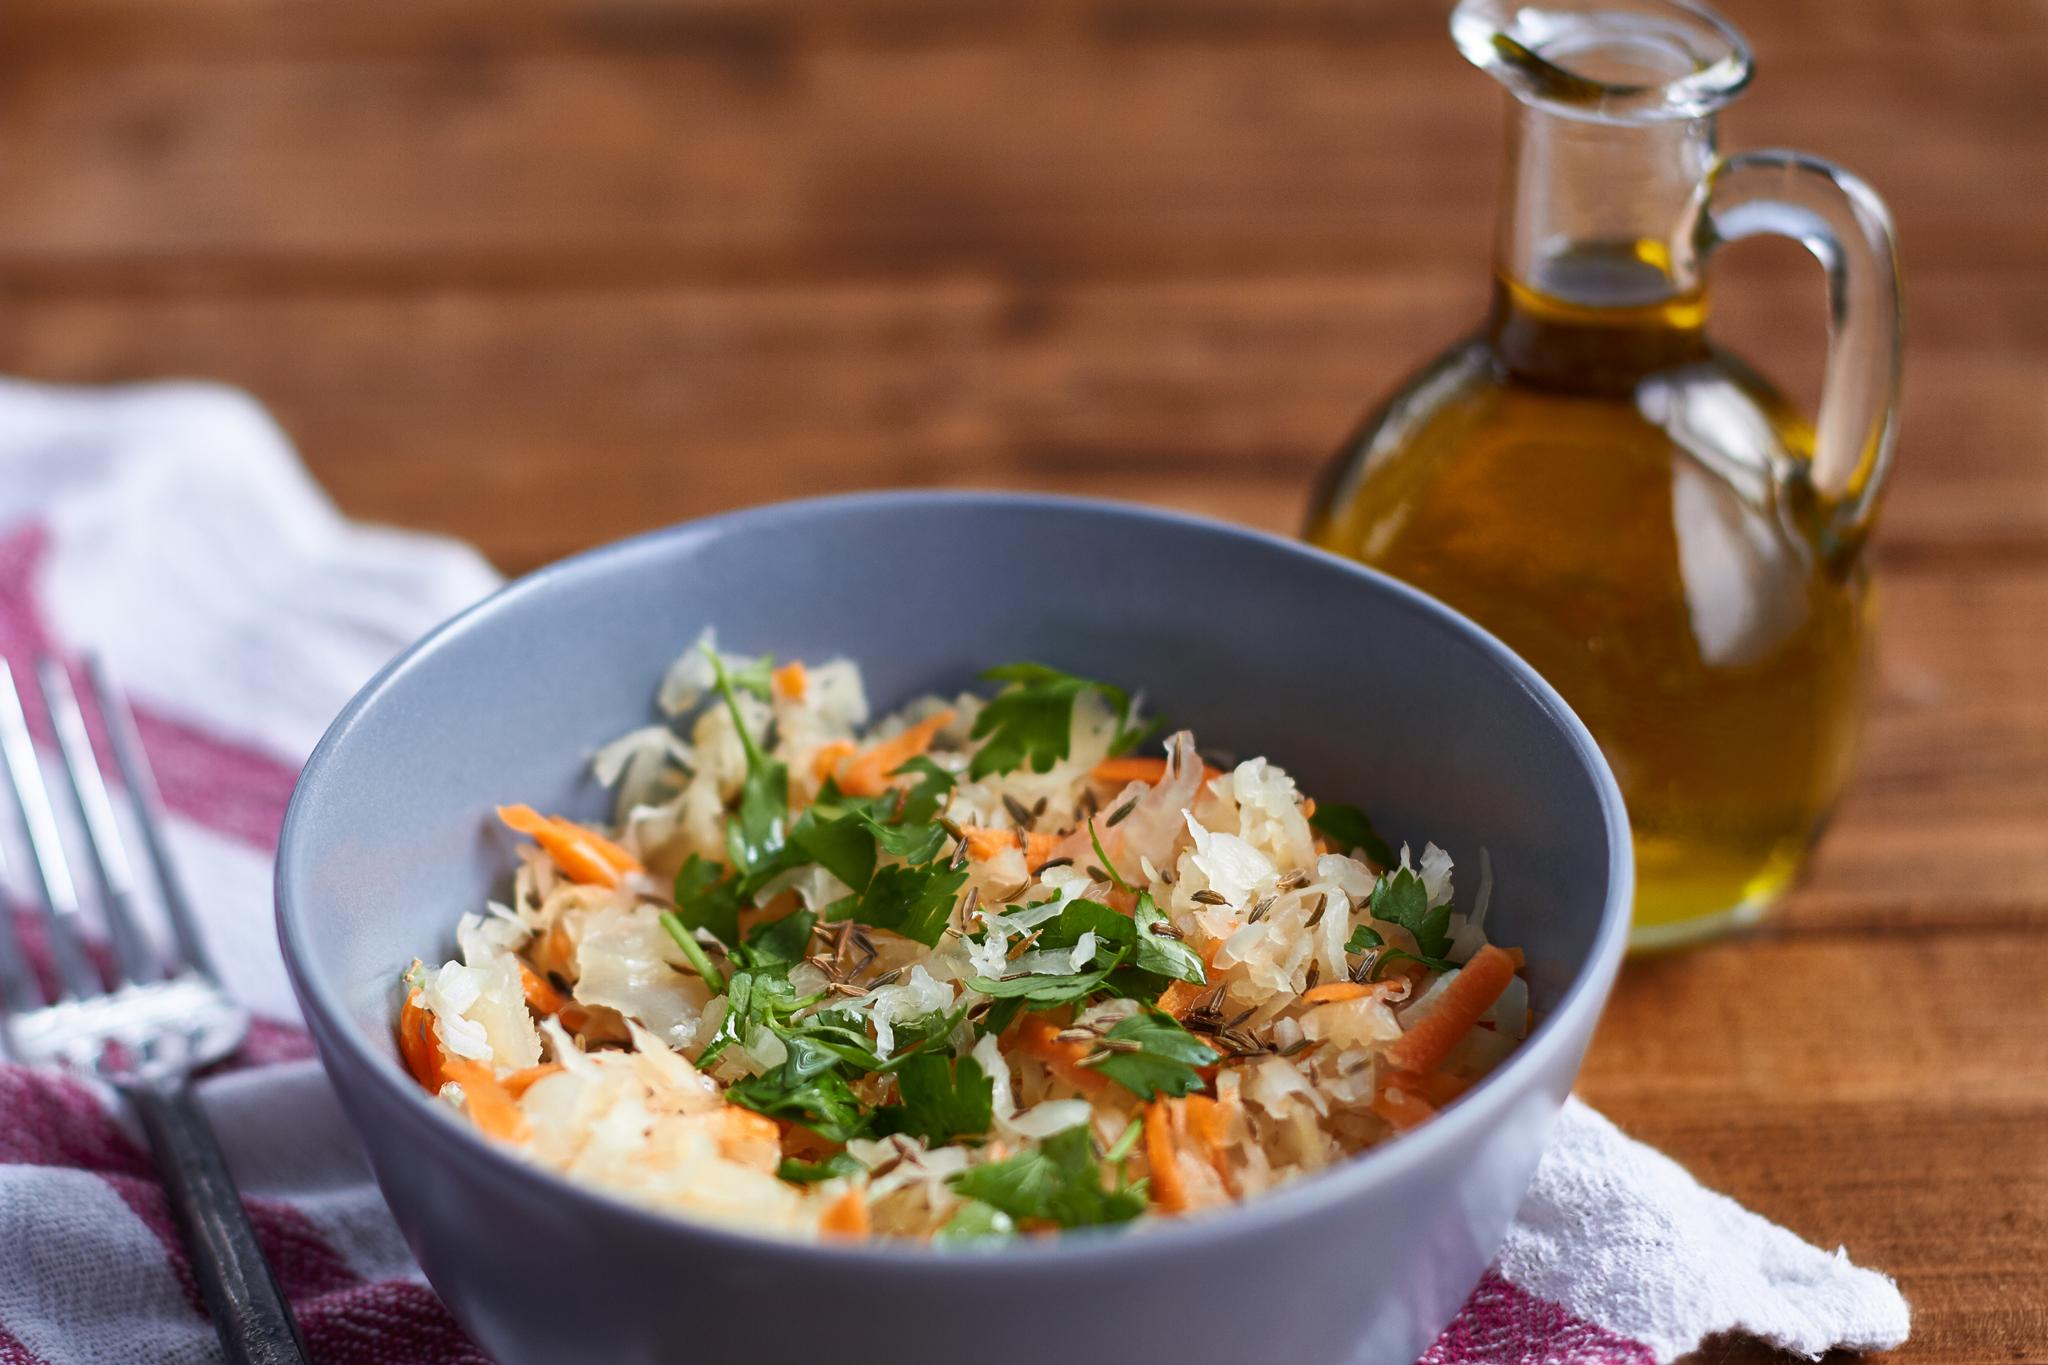 12 platos veganos listos en minutos